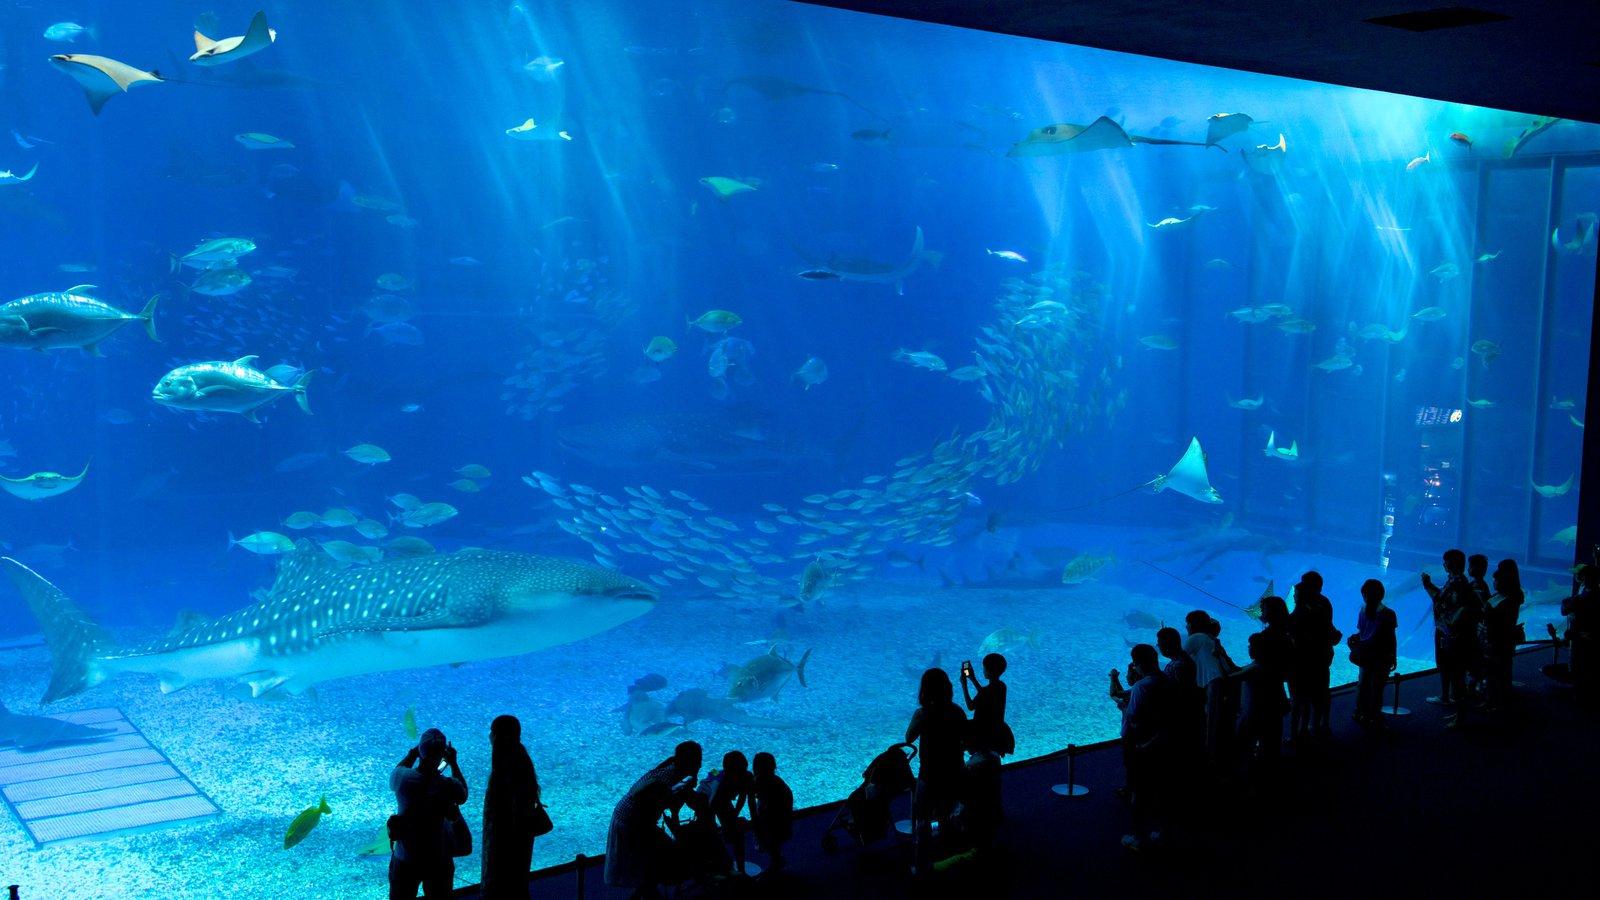 Okinawa Churaumi Aquarium showing marine life and interior views